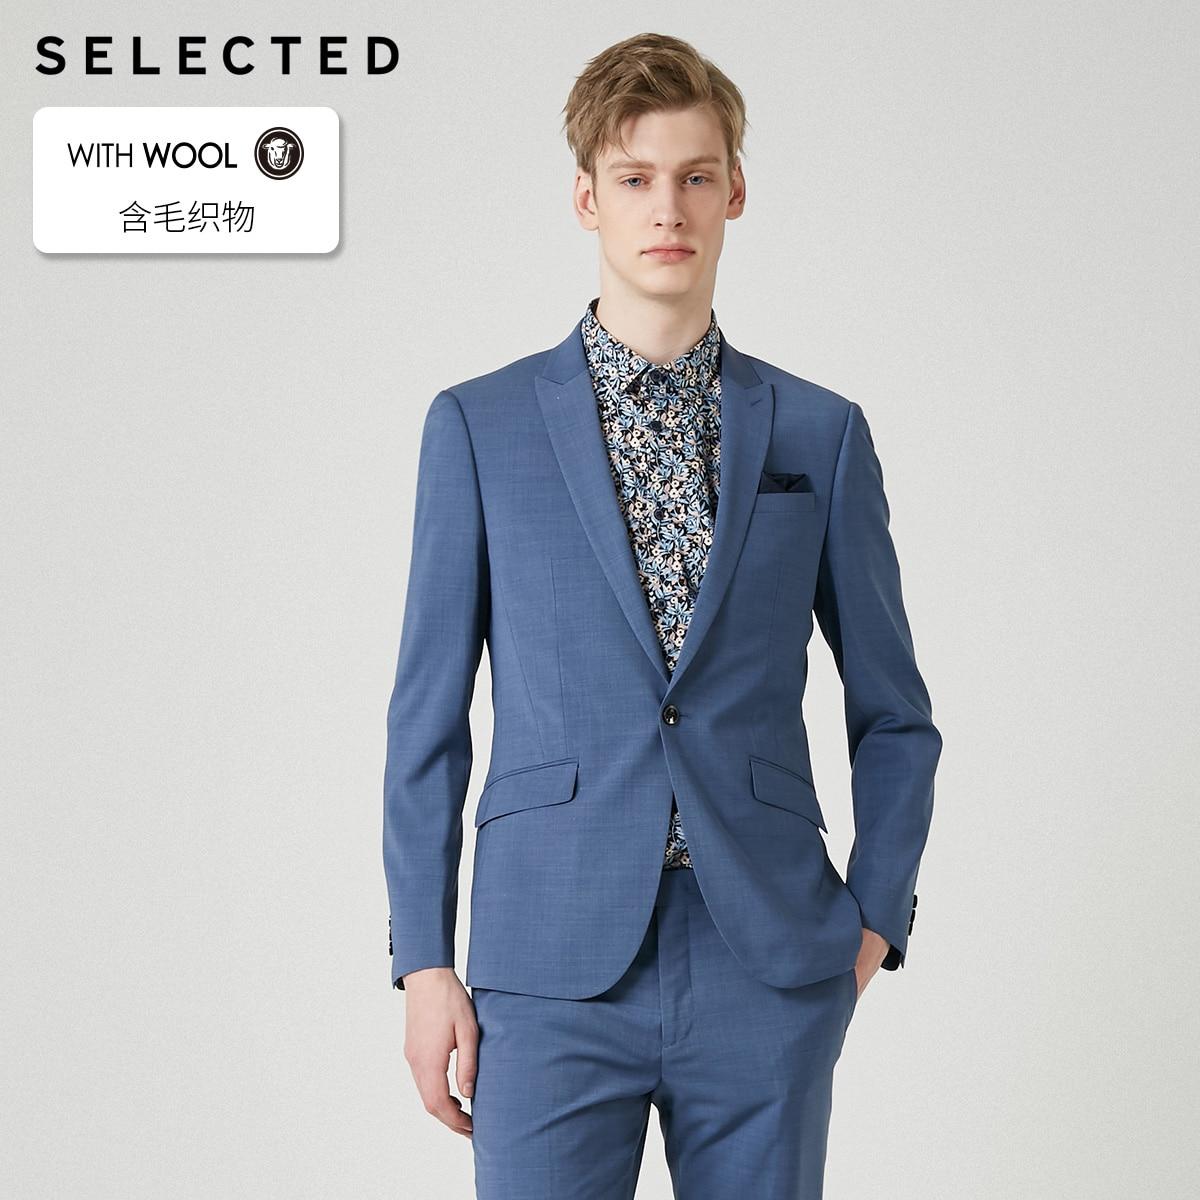 SELECTED Men's Slim-Fit Woolen Blazer Pure Color Closure Collar Jacket Clothes T   41925Y503